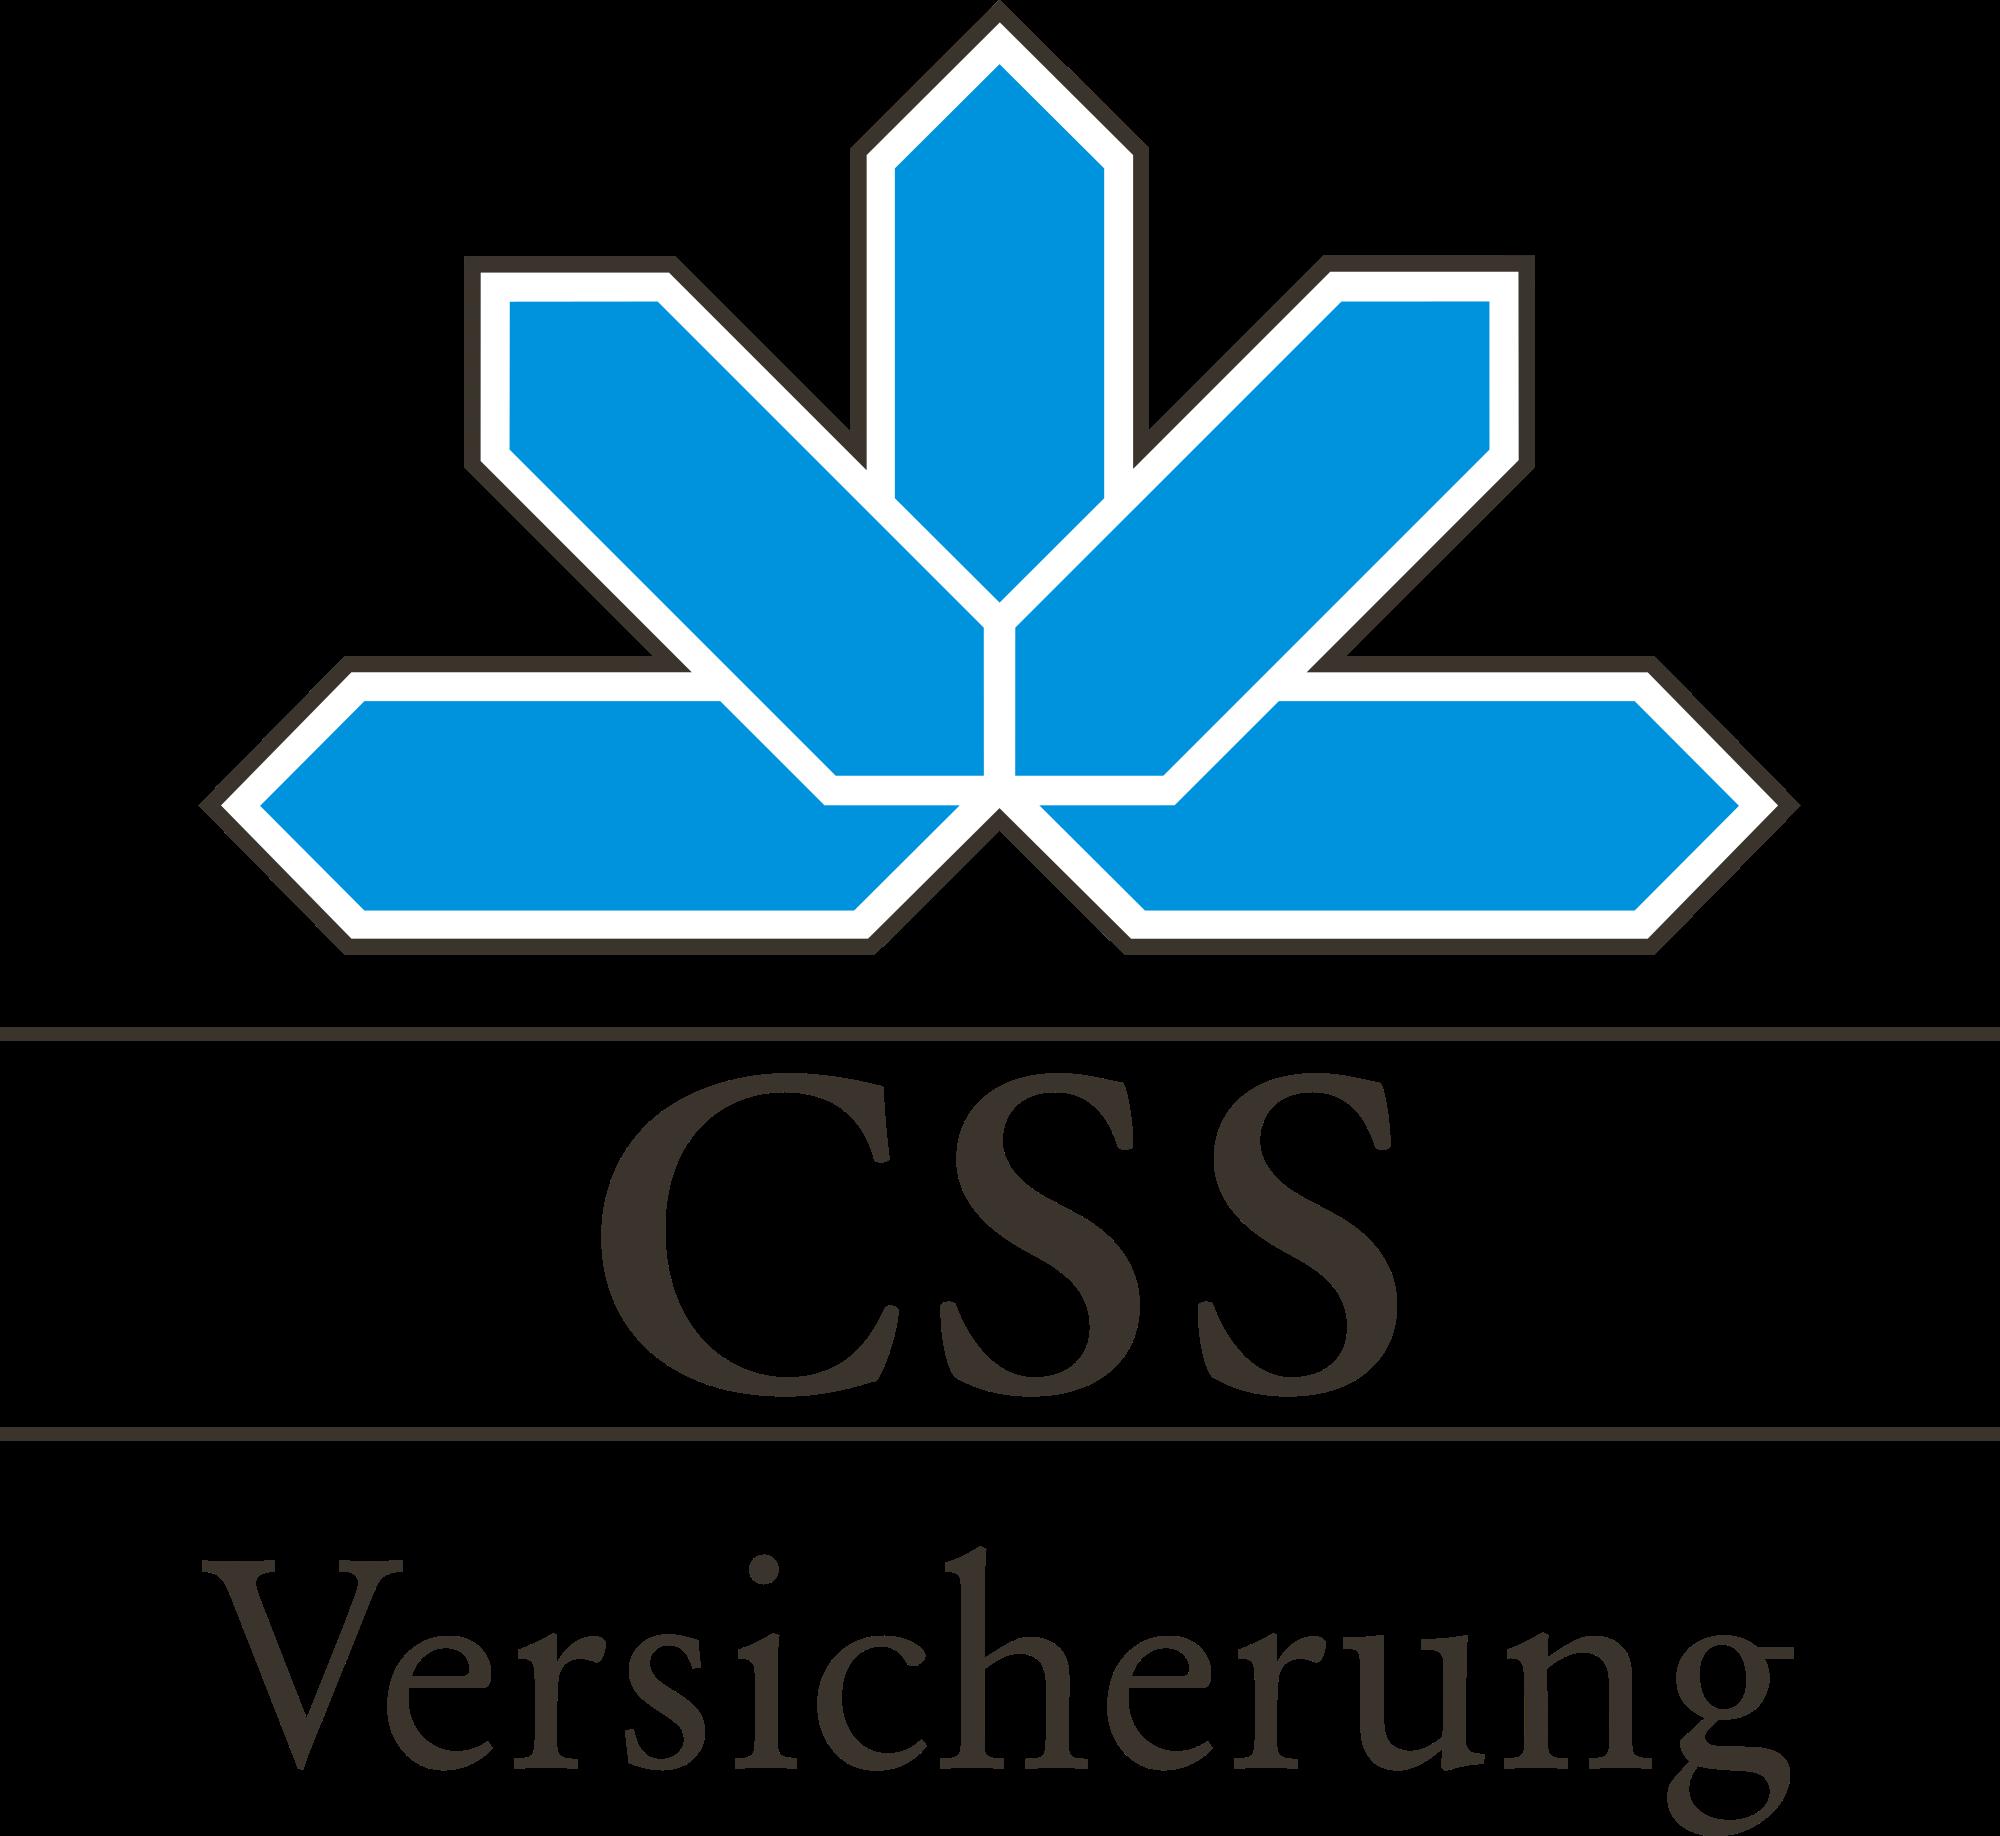 CSS-Versicherung.svg